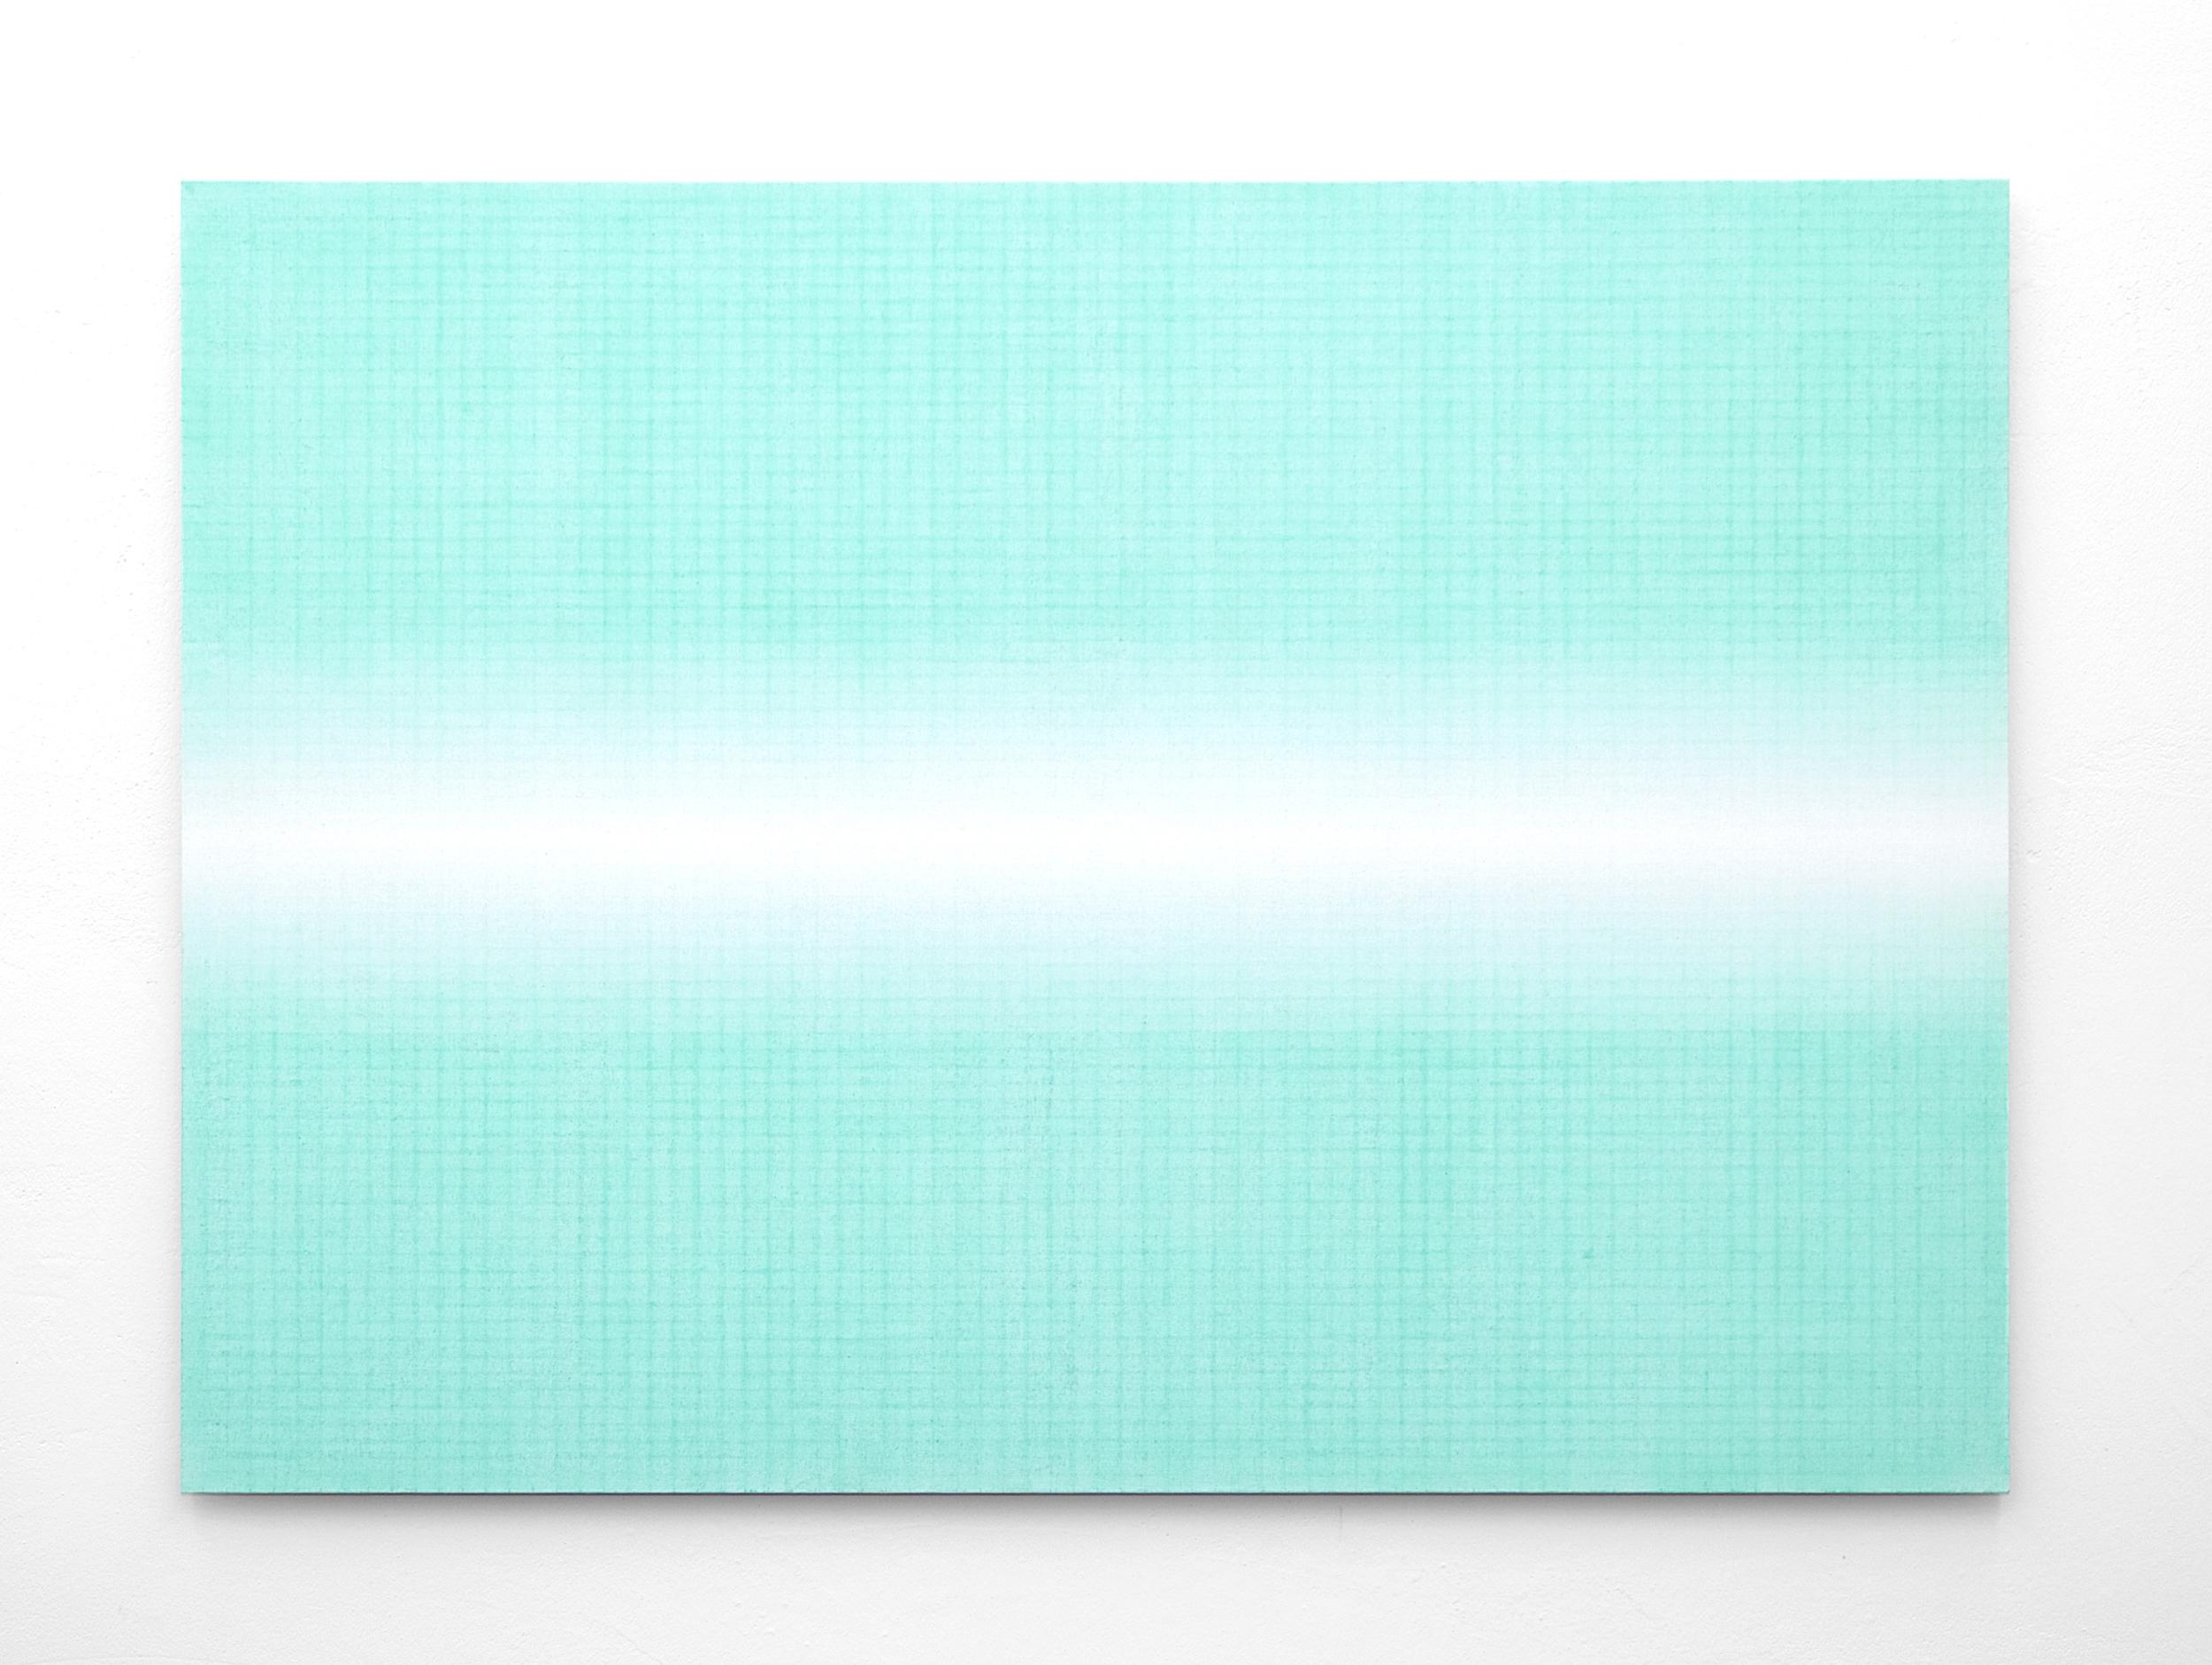 bild nr. 03/2012-100 x 140cm - acryl auf baumwolle/alu